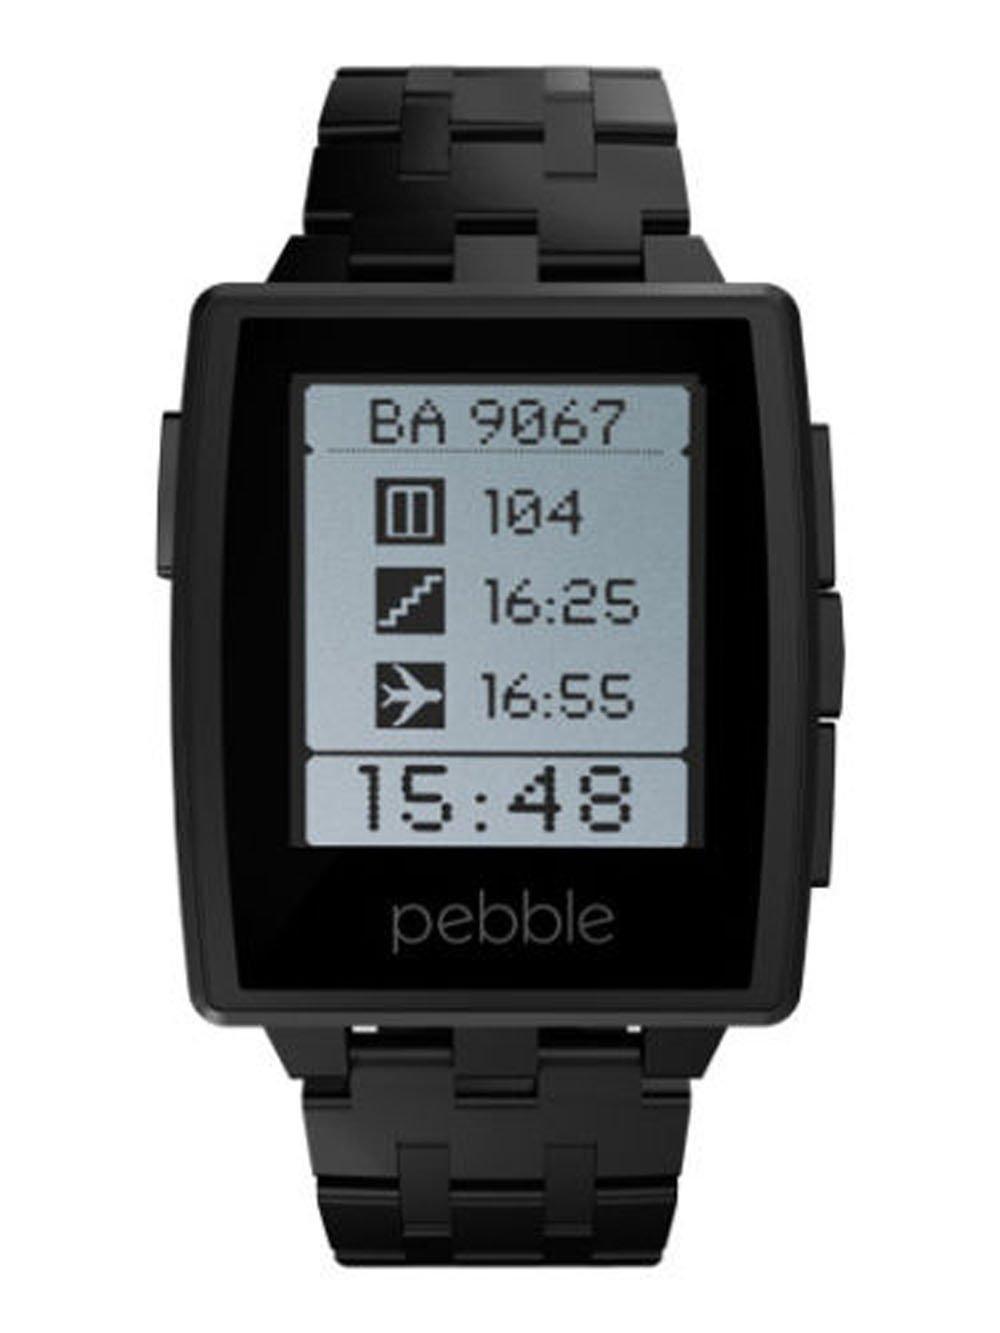 Amazon.com: New! Pebble Steel Smartwatch / Smart Watch for ...